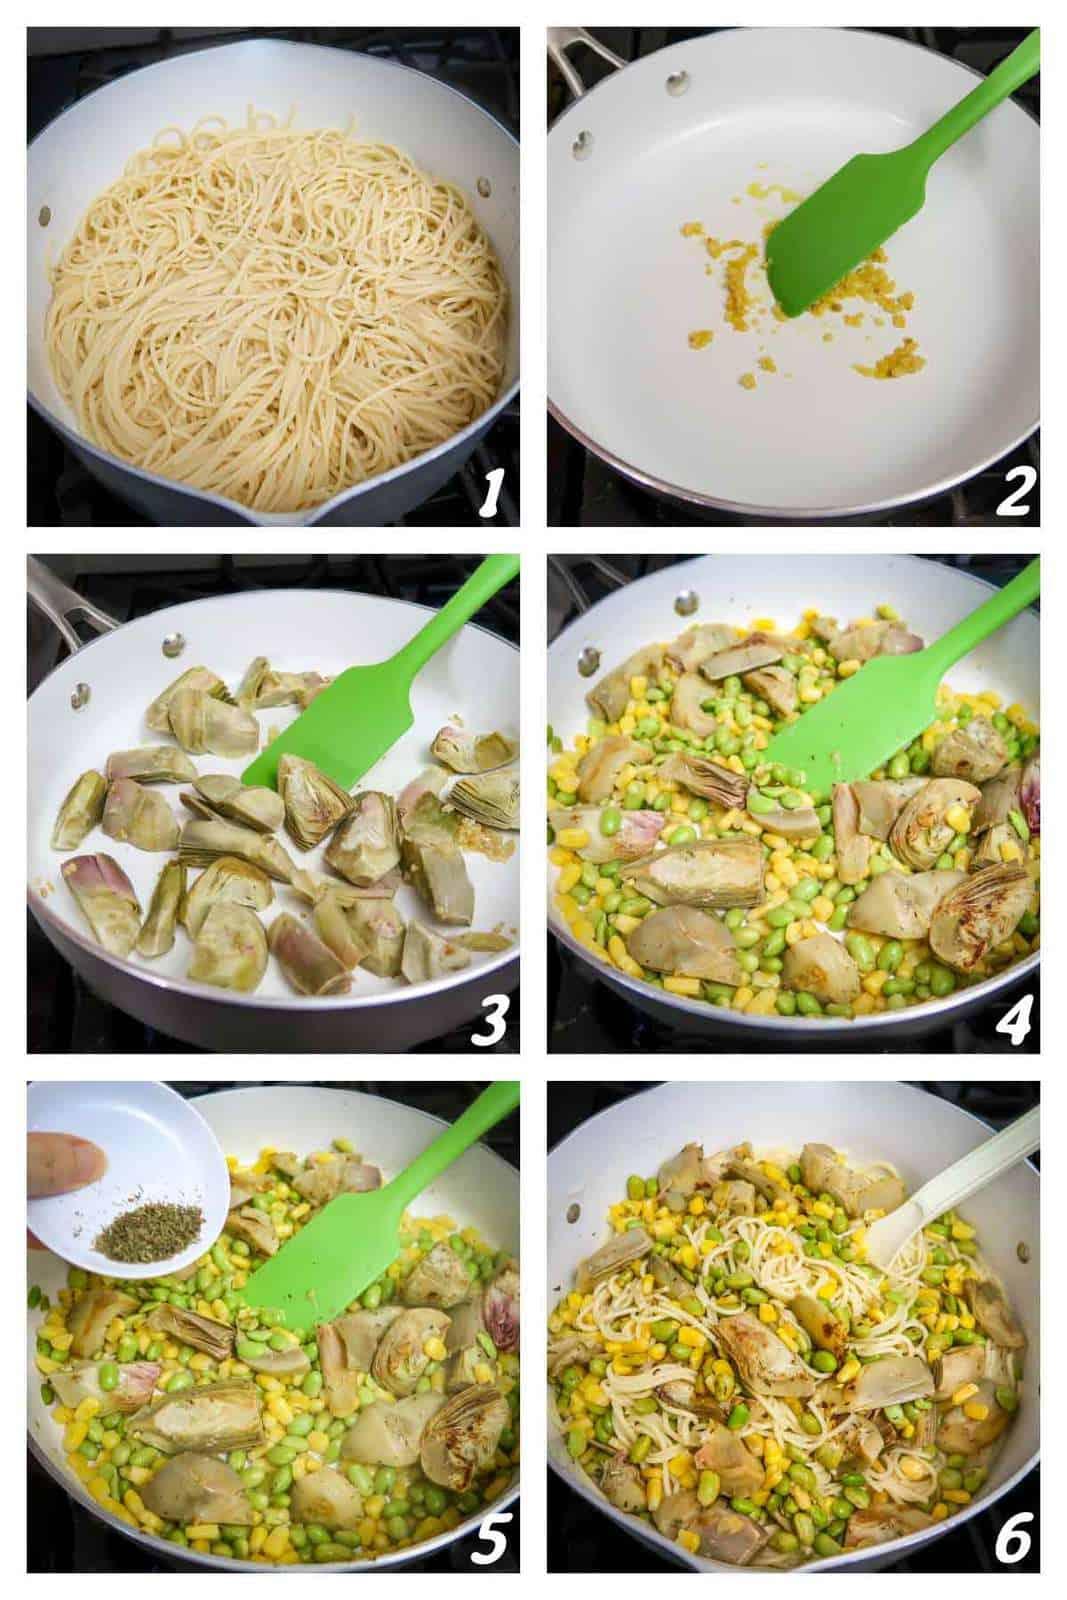 6 photos demonstrating the process of making Lemon Artichoke Pasta.